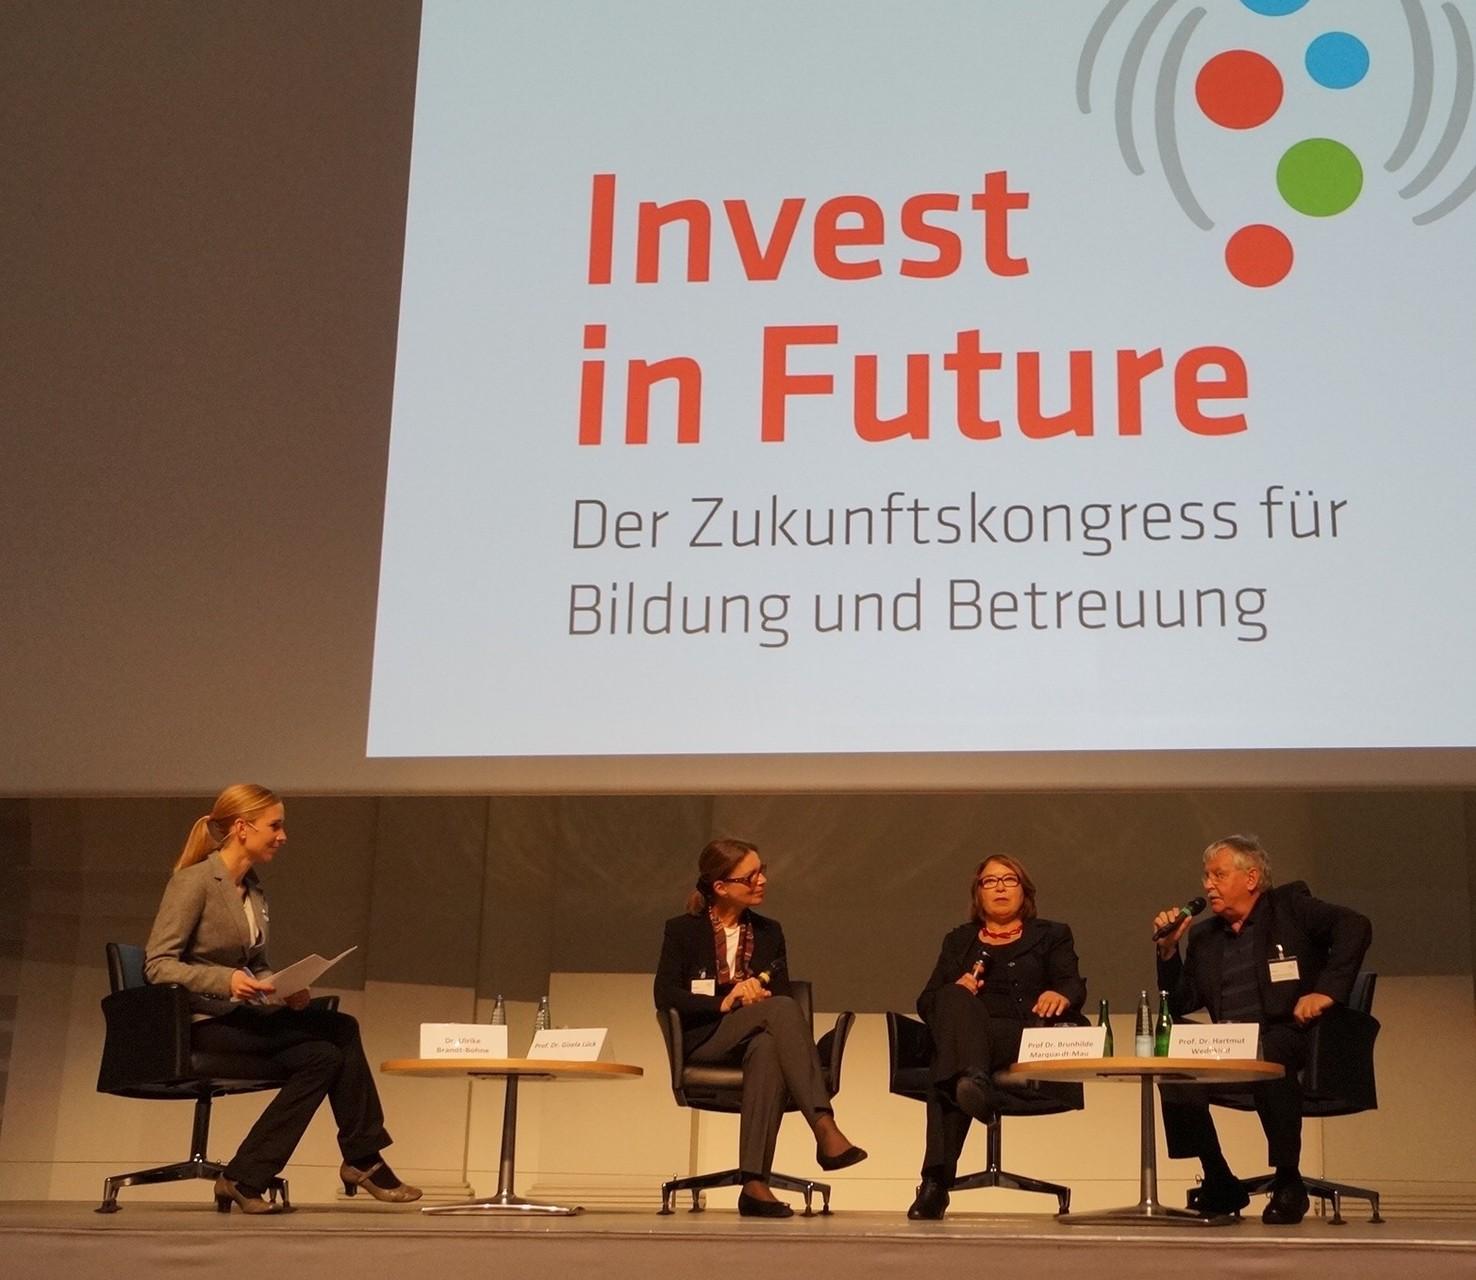 Podiumsdiskussion Invest in Future Zukunftskongress @Invest In Future